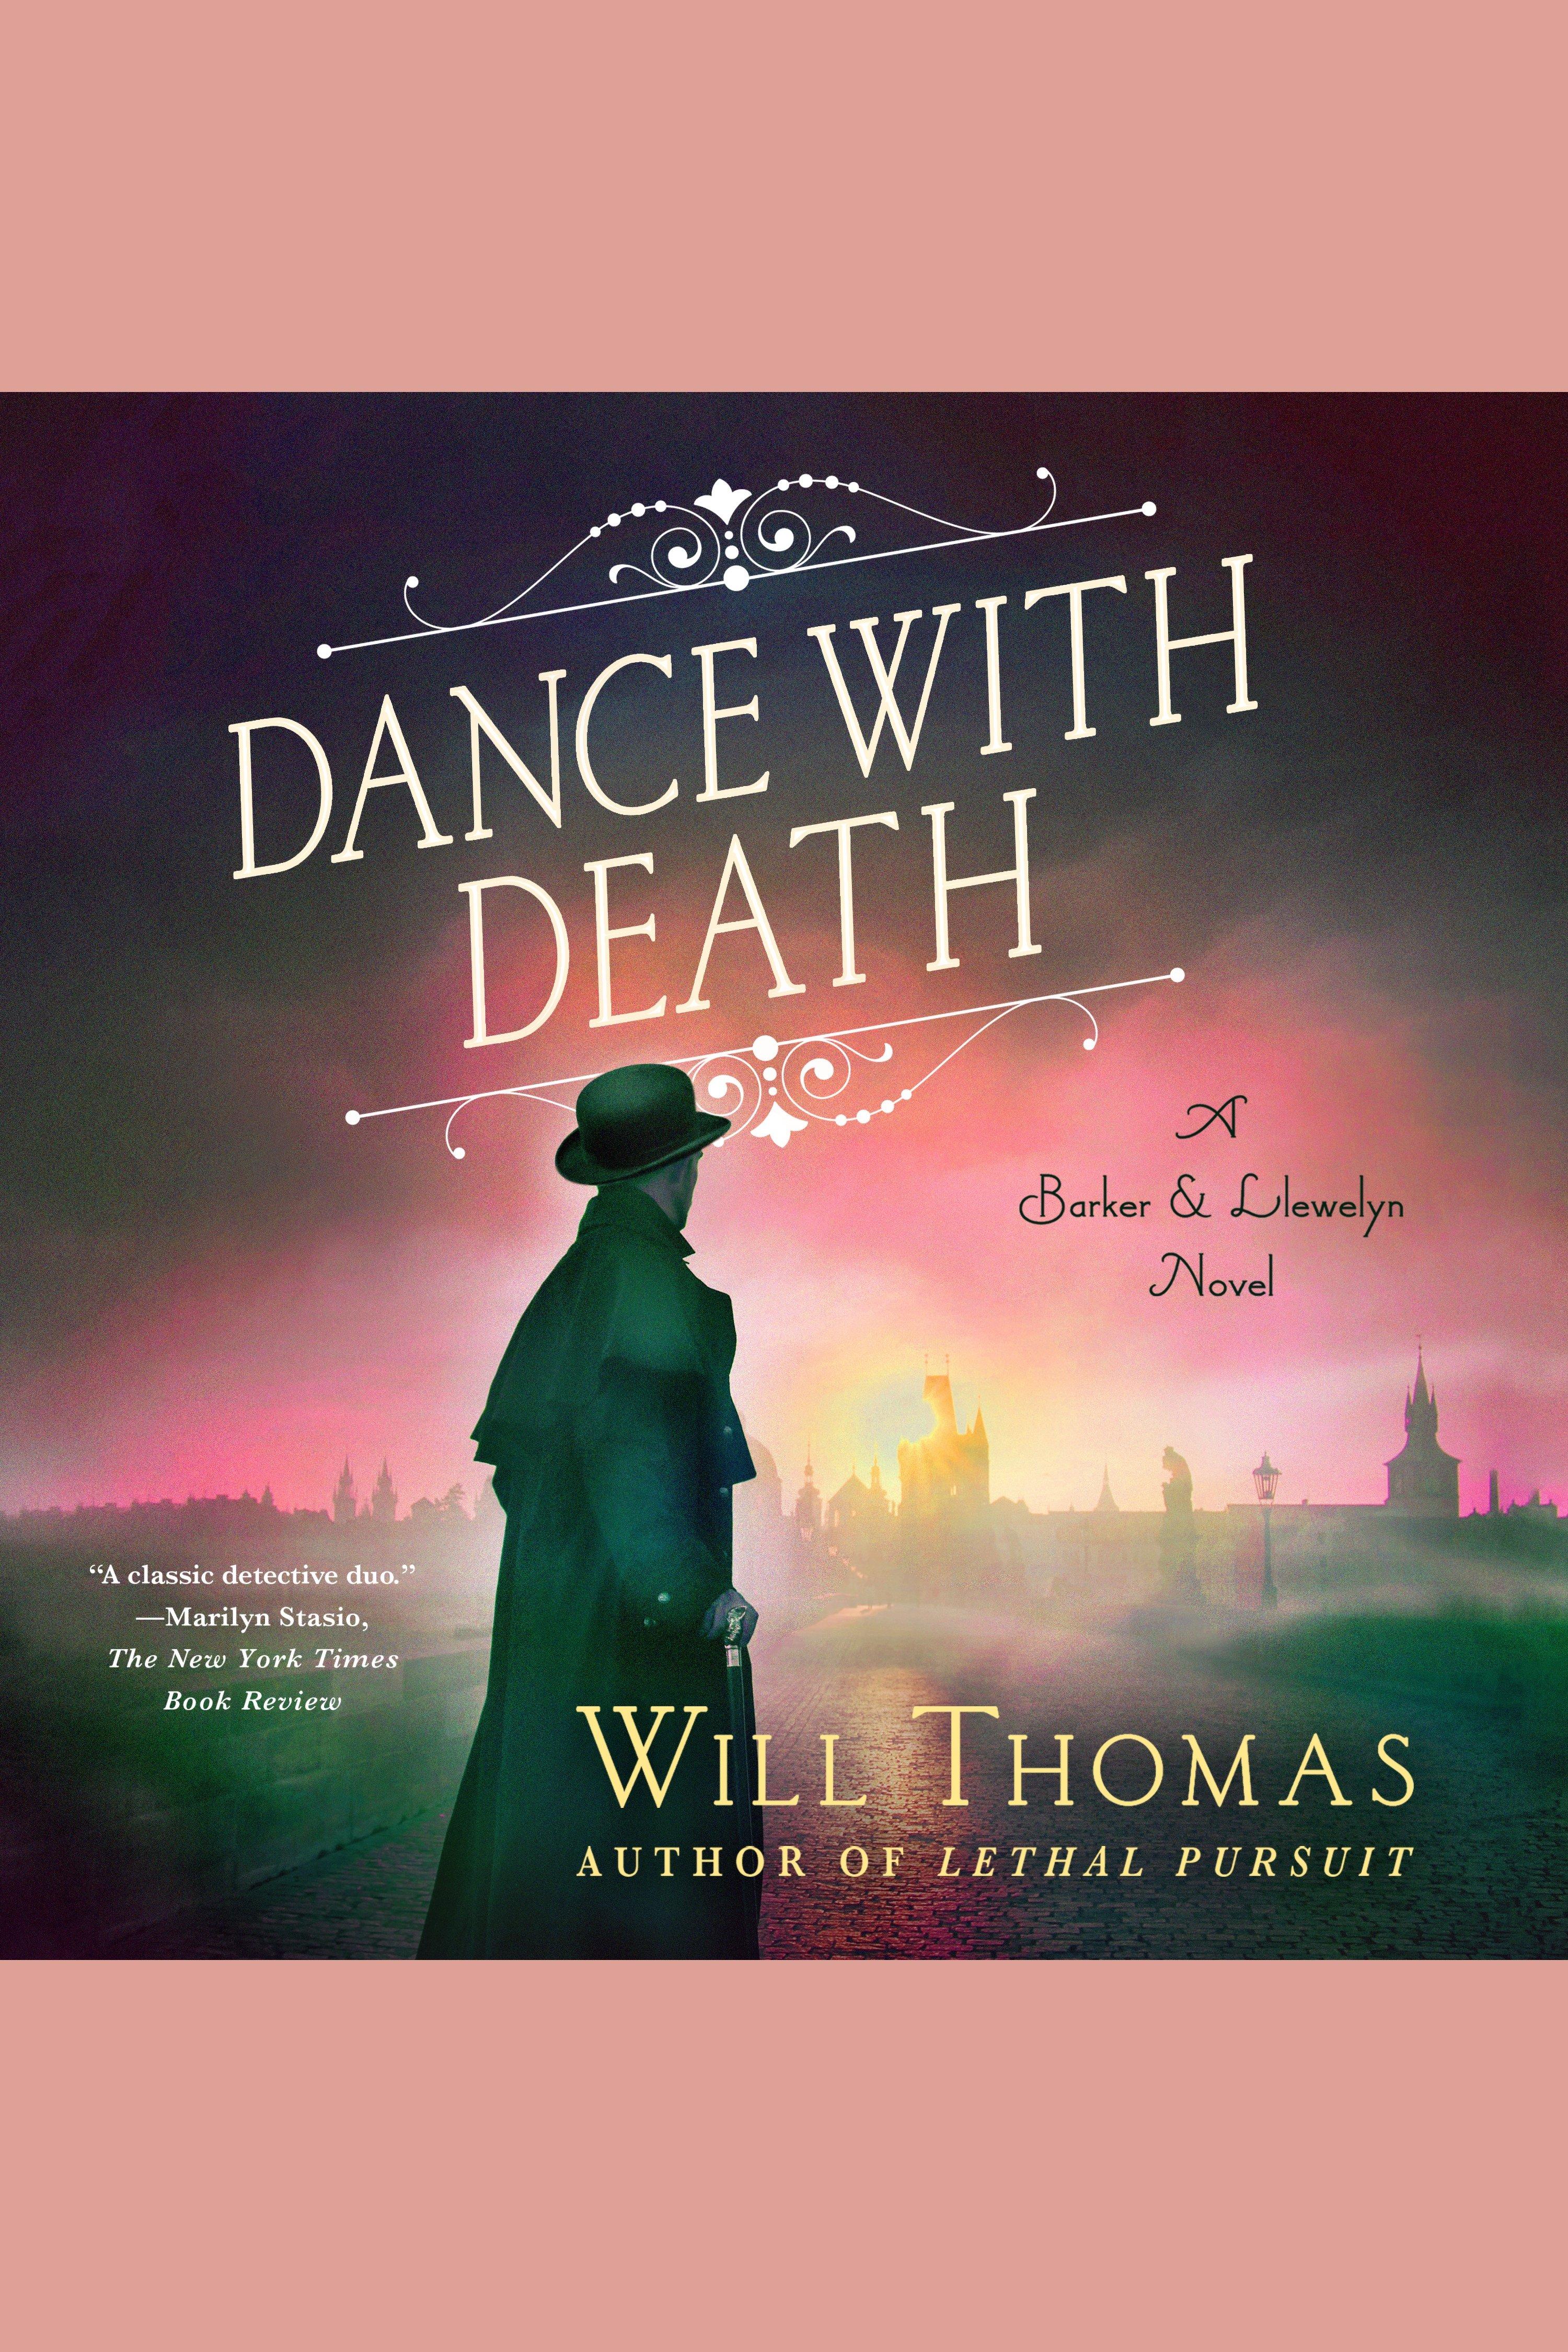 Dance with Death A Barker & Llewelyn Novel